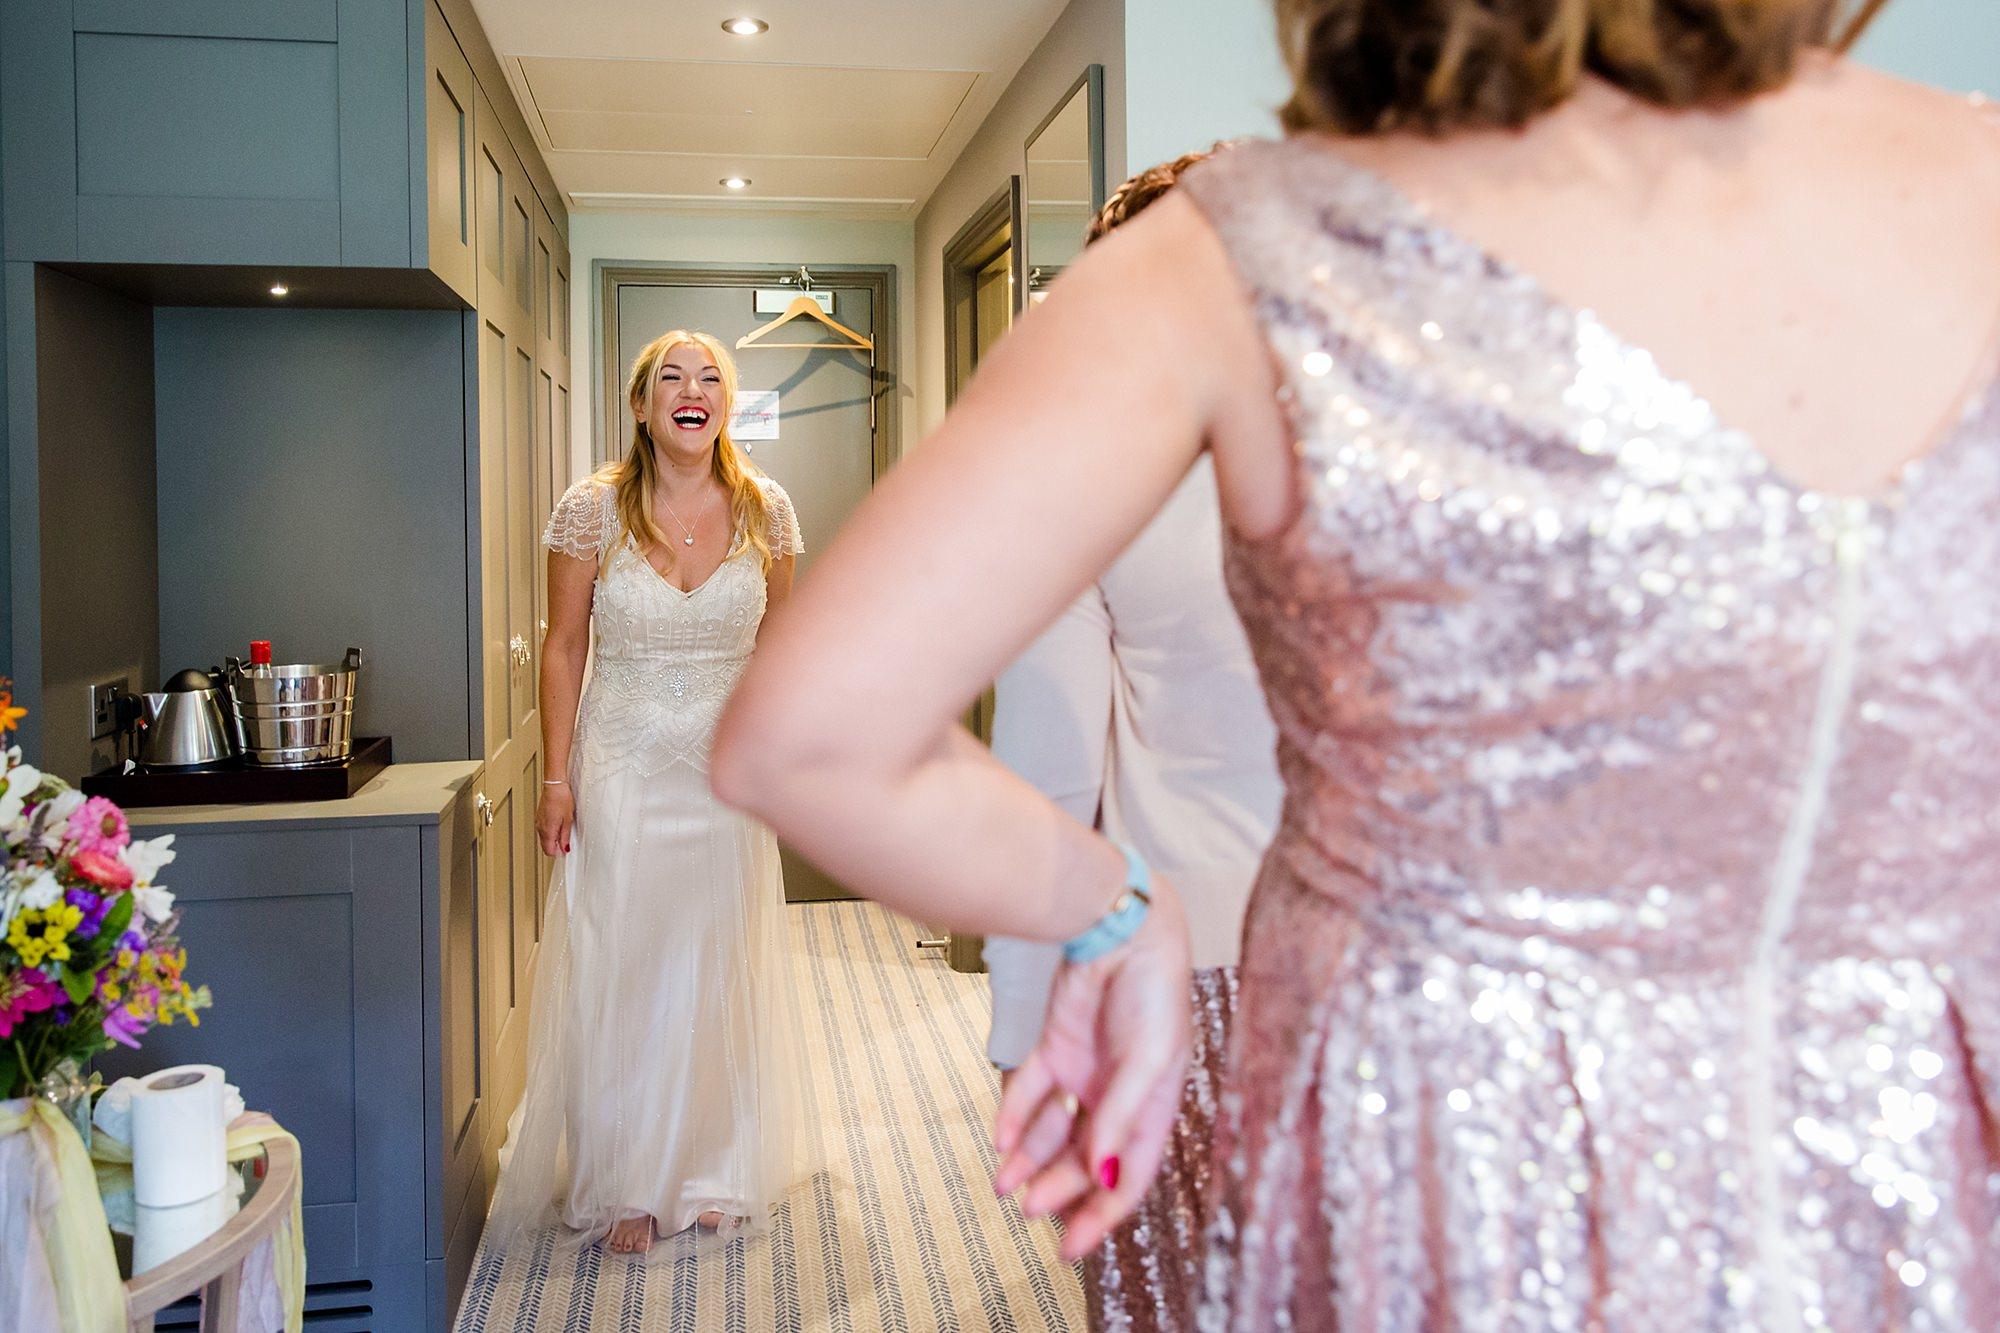 Woodland Weddings Tring laughing bride